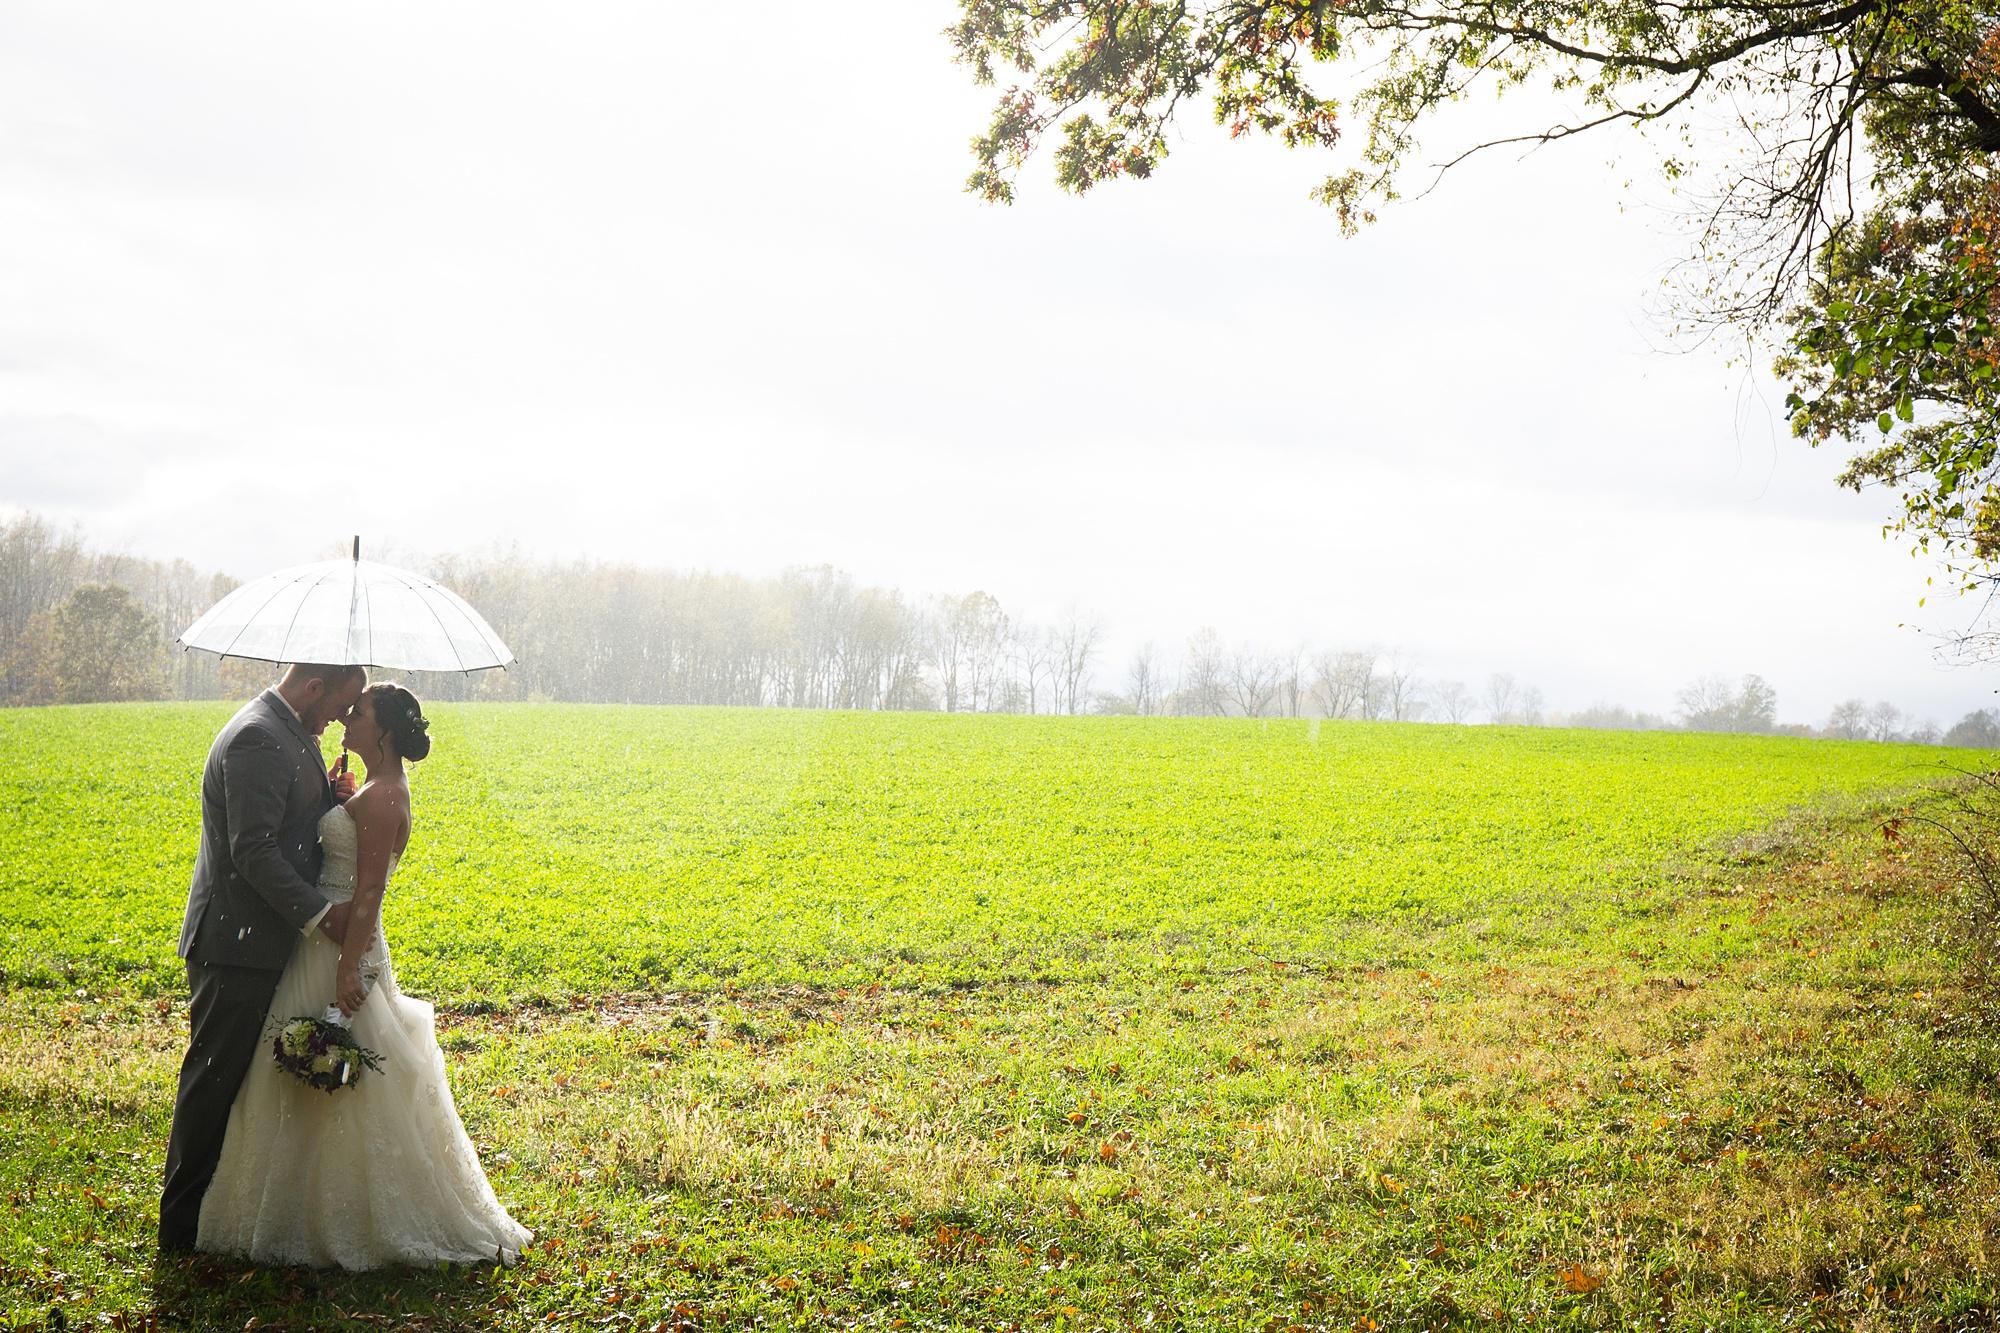 Brandon_Shafer_Photography_Emily_Travis_Kalamazoo_Wedding_Photography_0037.jpg